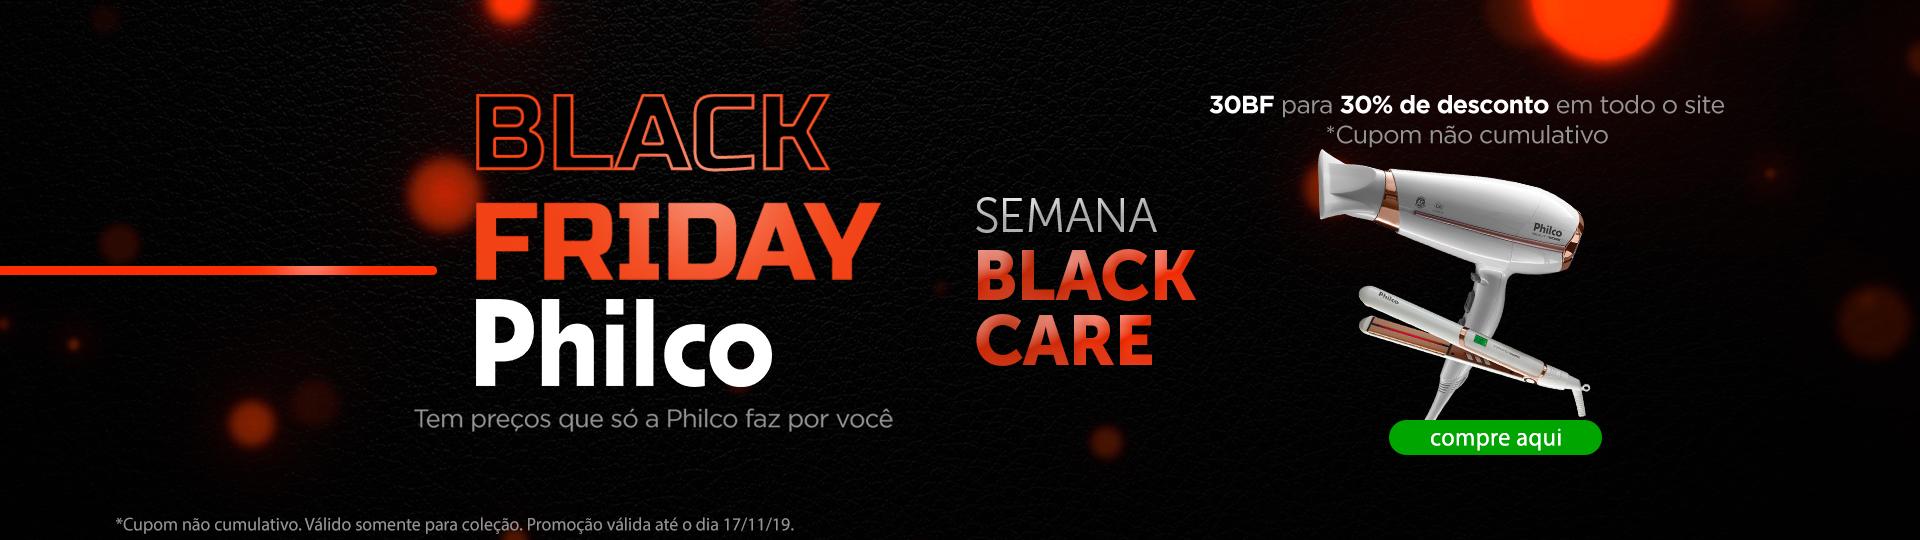 BLACK CARE